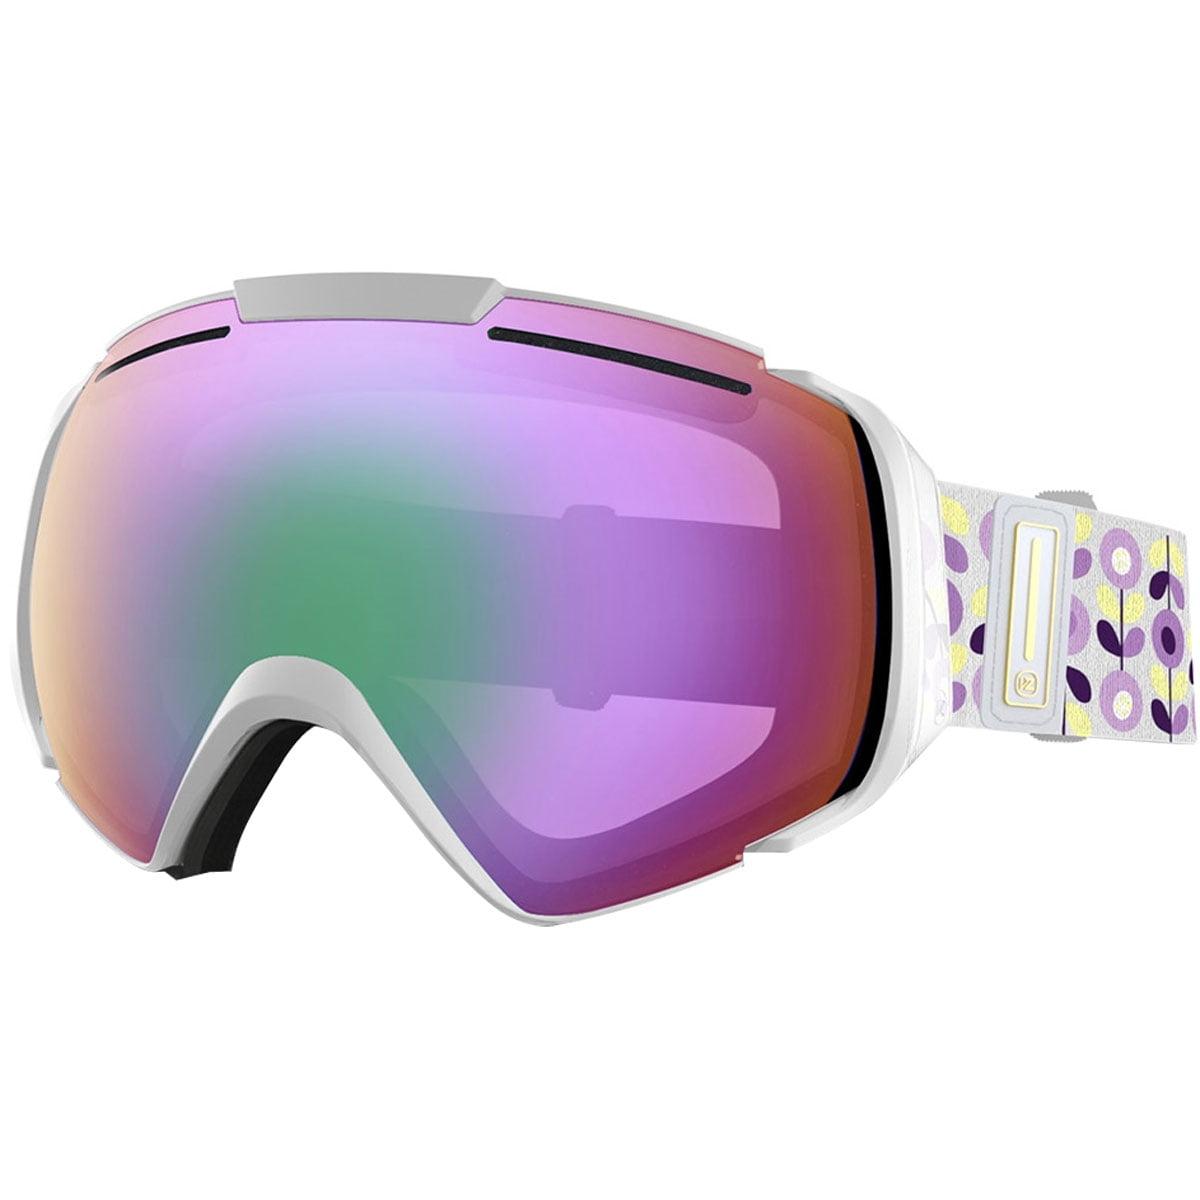 VonZipper Adult El Kabong Snowmobile Goggles - Black Satin/Black Chrome / One Size